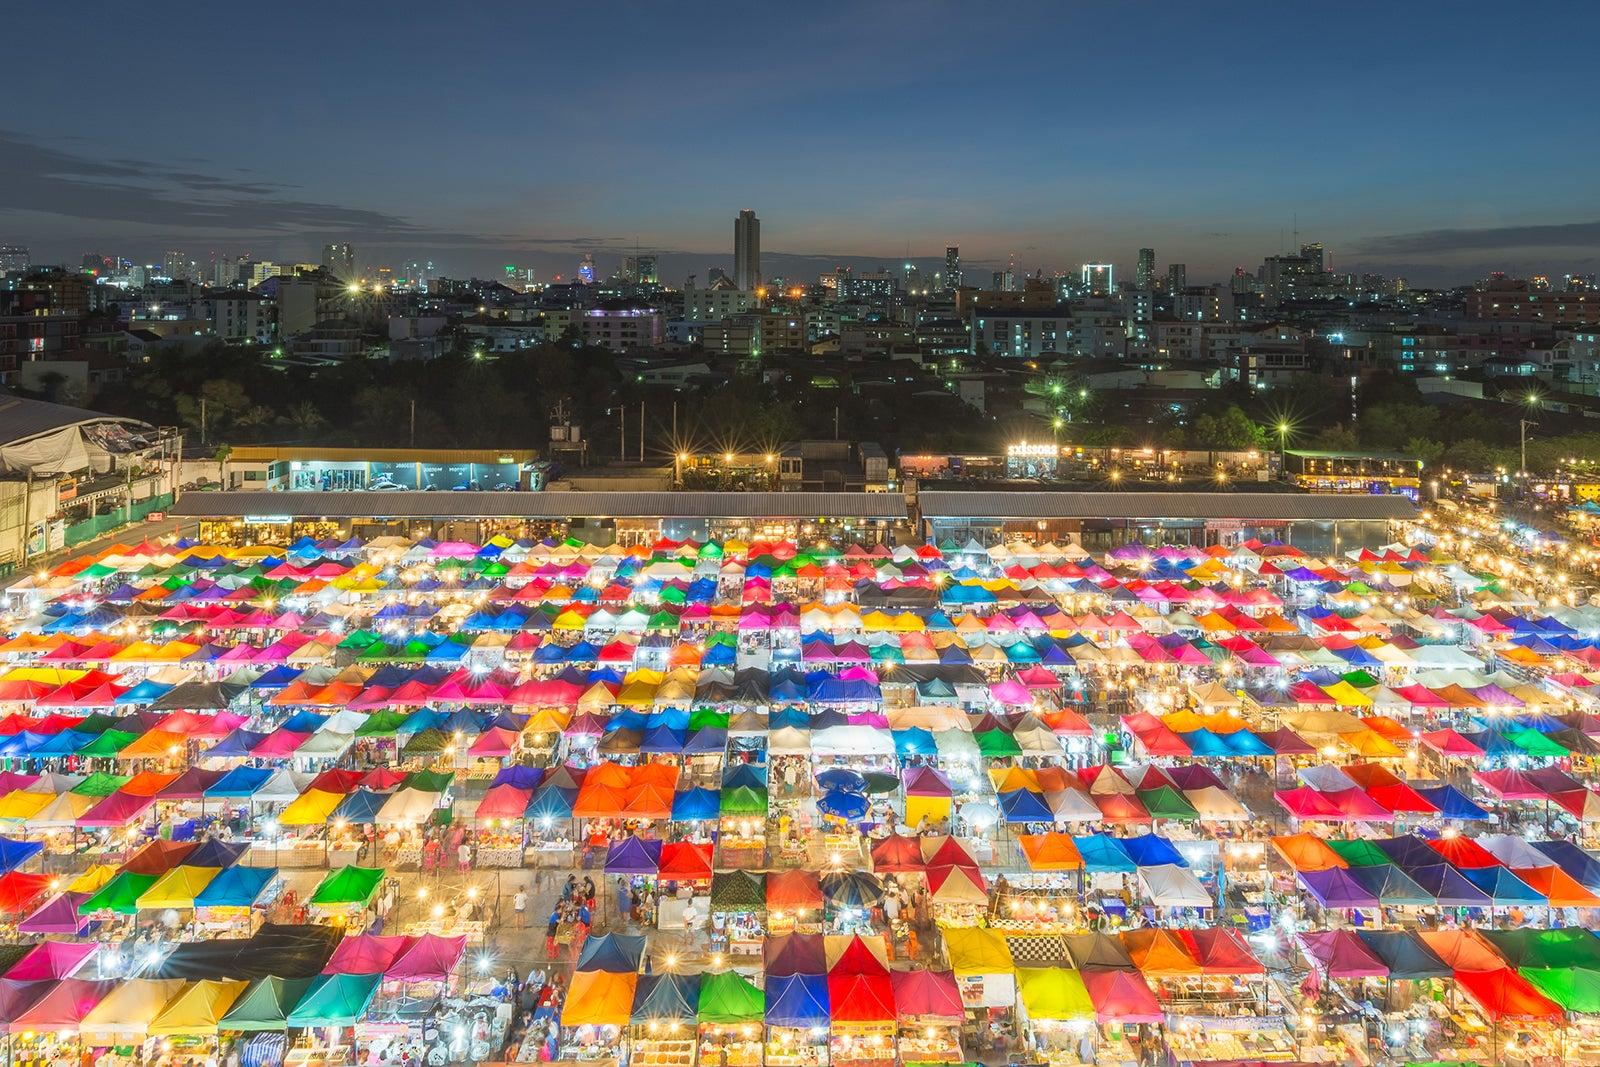 Rot Fai Market Ratchada - Bangkok's Train Market on Ratchadaphisek Road – Go Guides